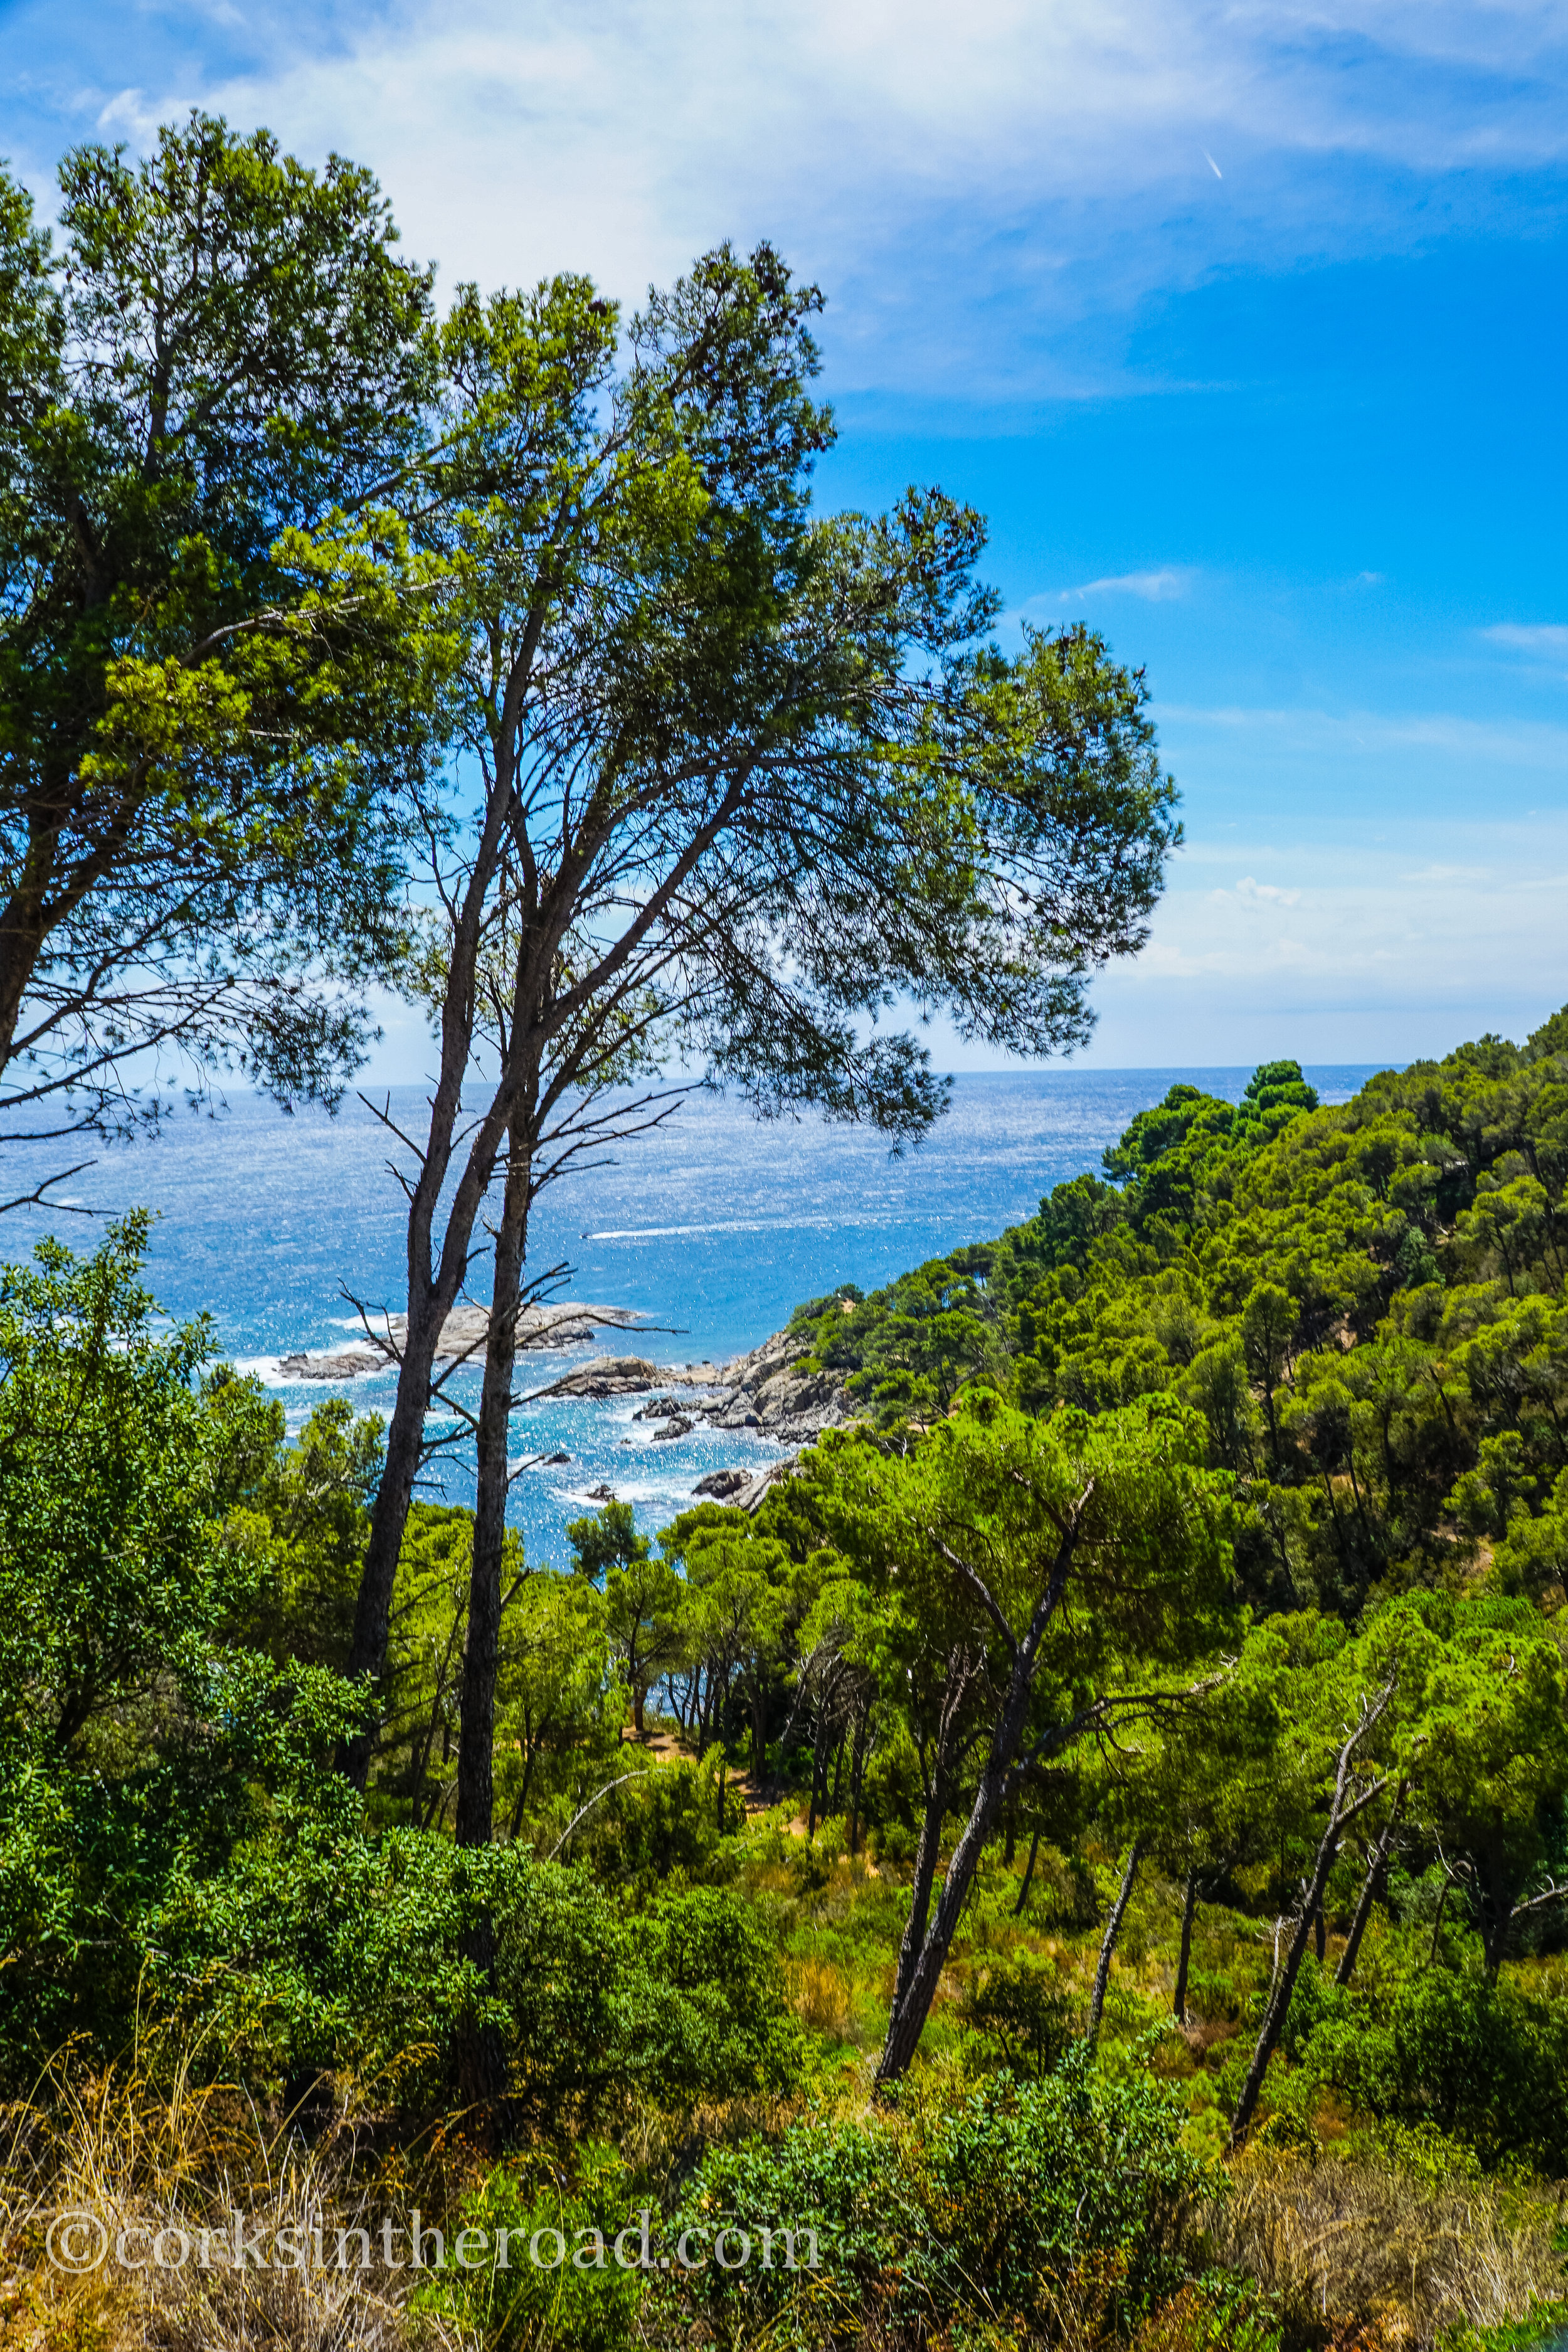 20160810Barcelona, Corksintheroad, Costa Brava, Costa Brava Landscape-28.jpg